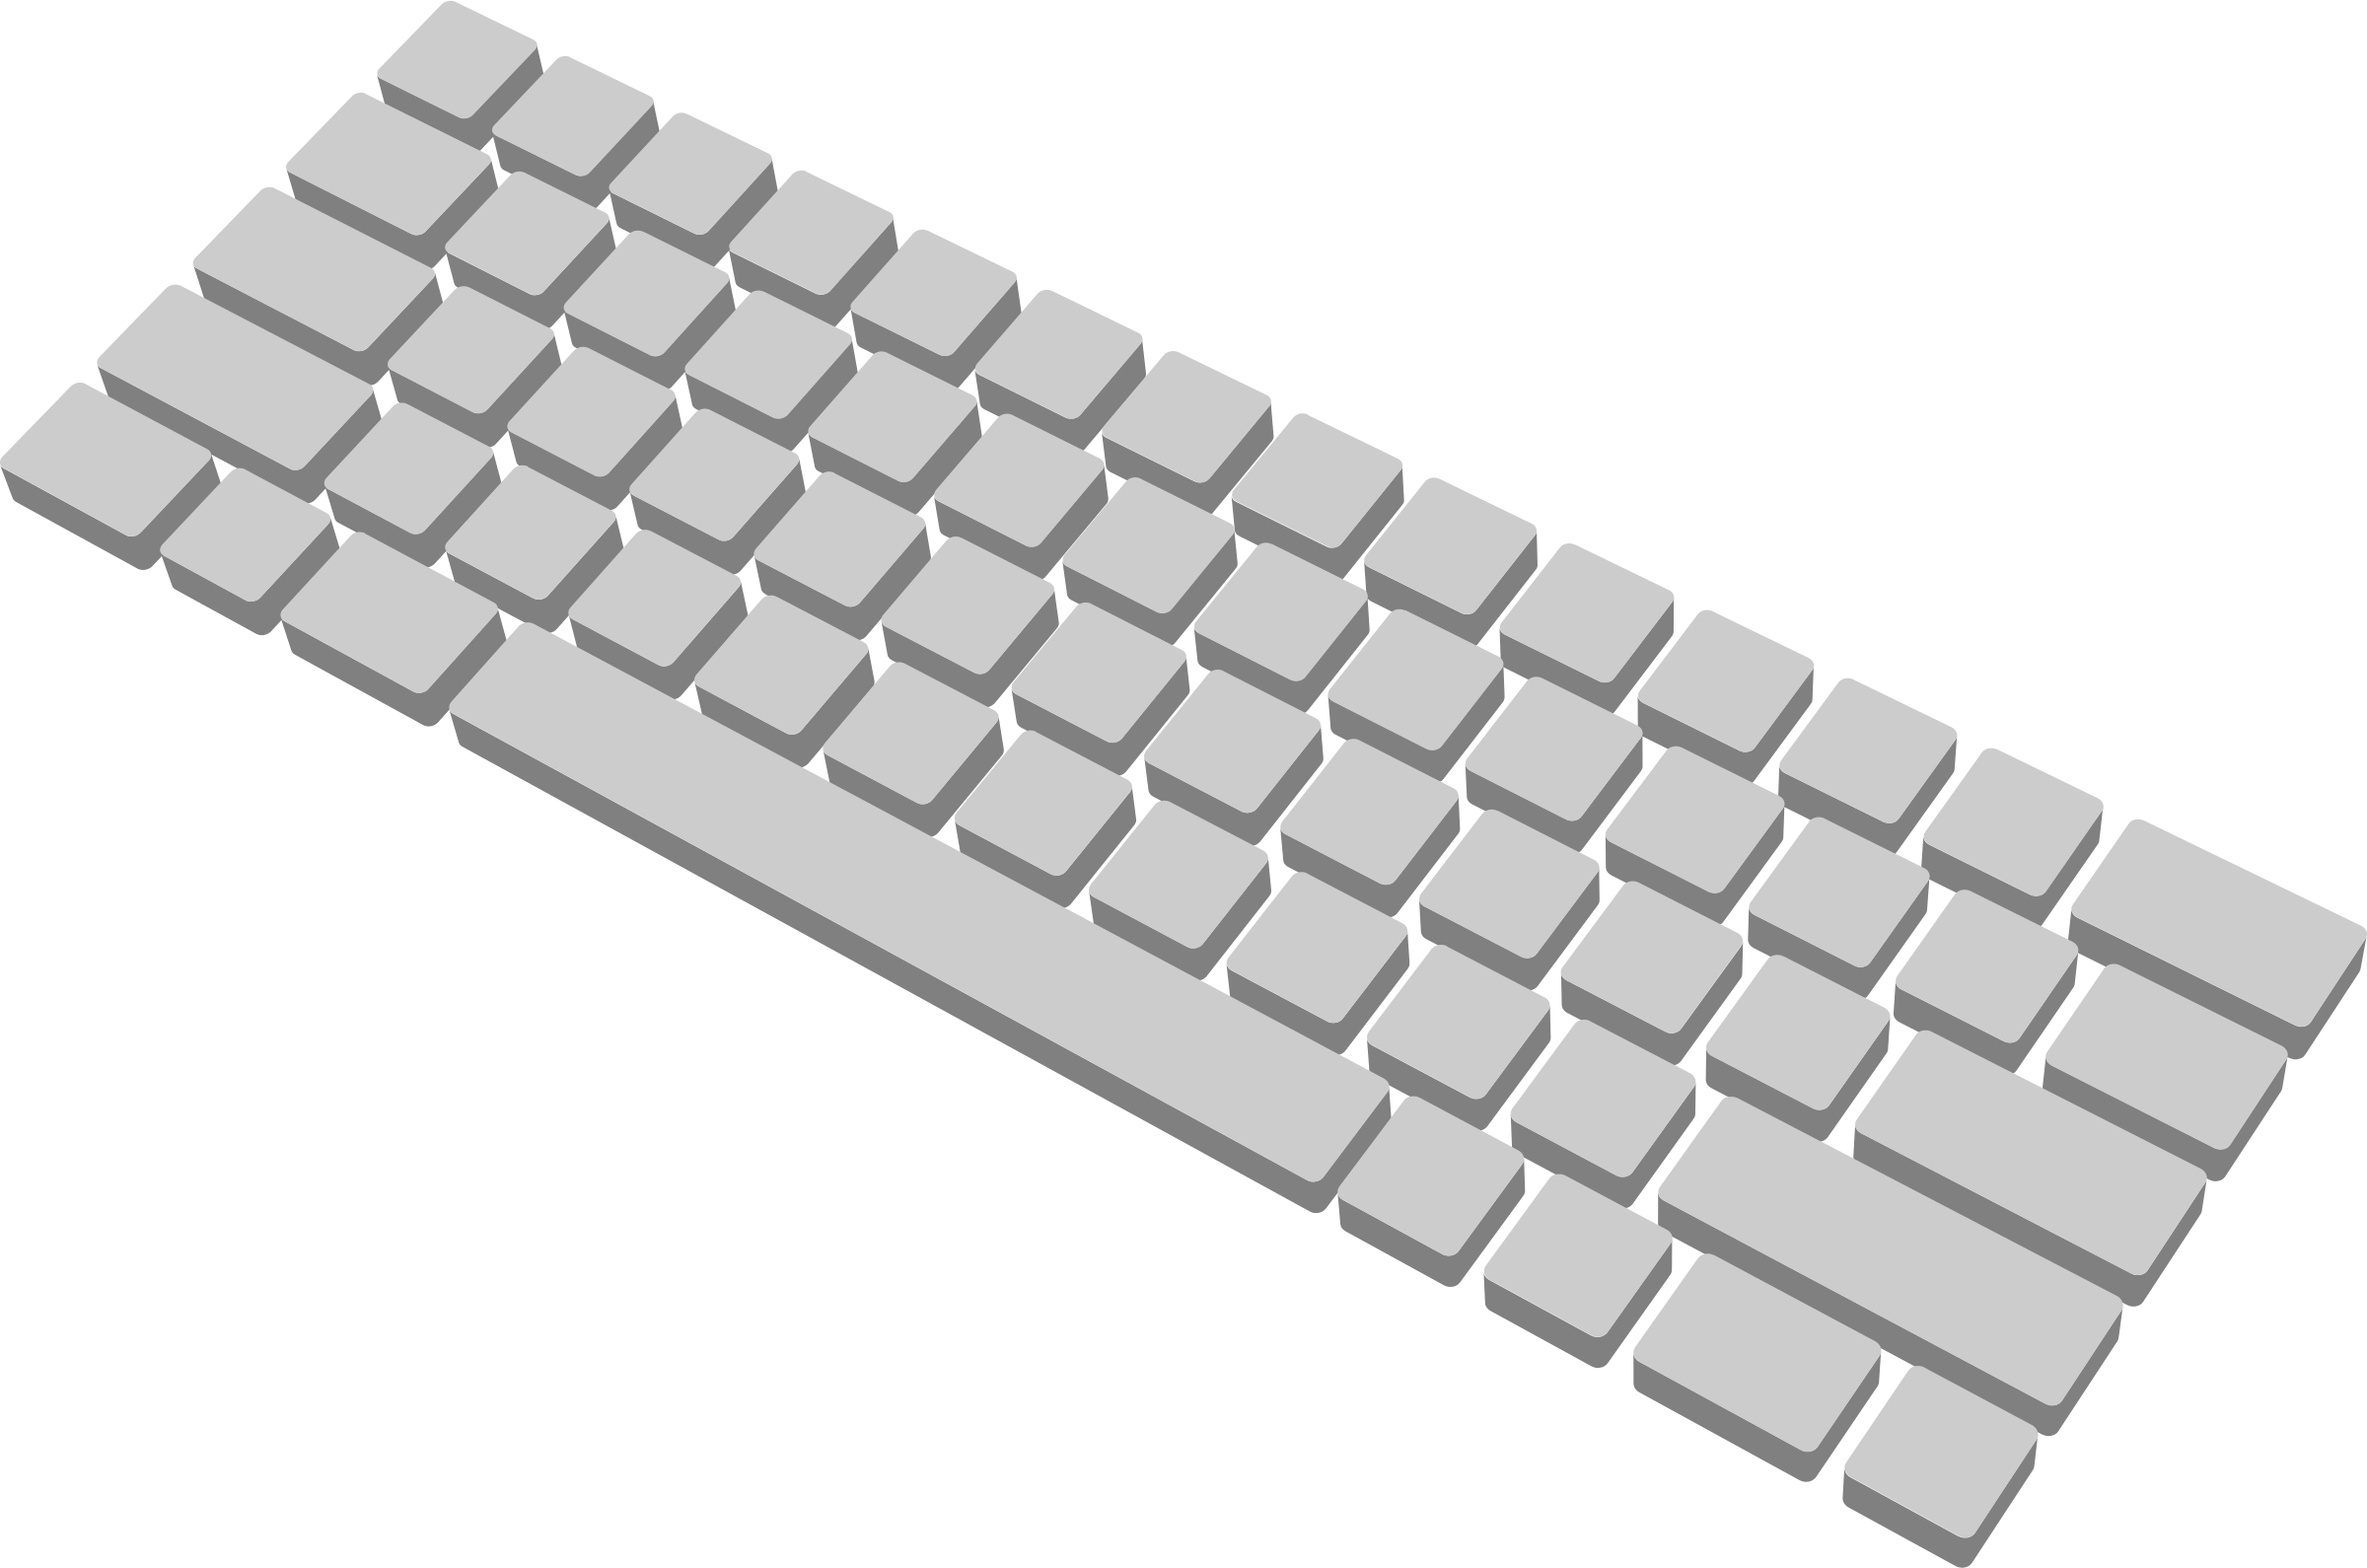 3d keyboard computer clipart.  d clipartfest big